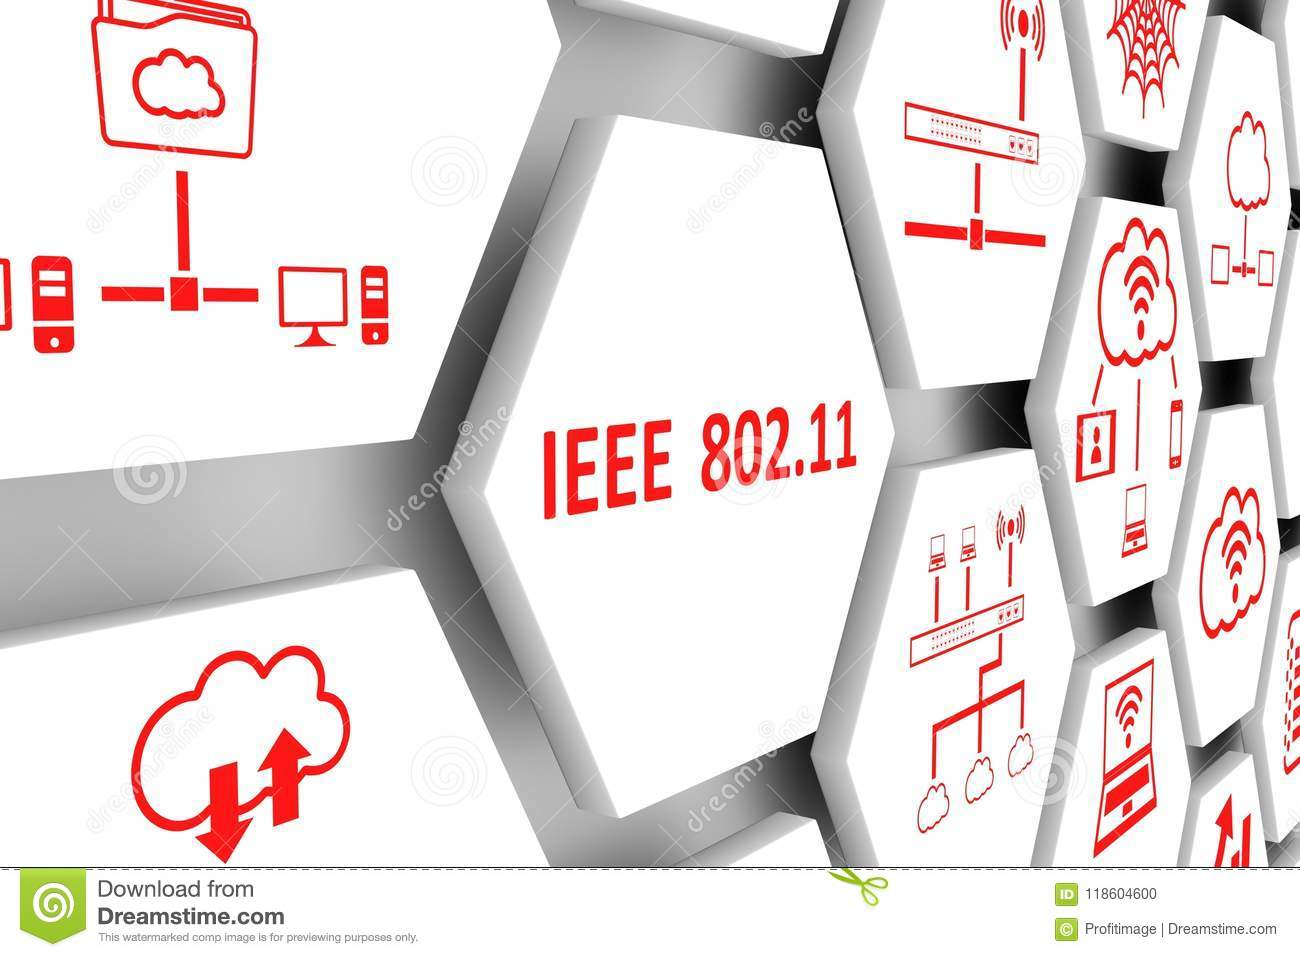 IEEE 802 11 concept stock illustration. Illustration of illustration.